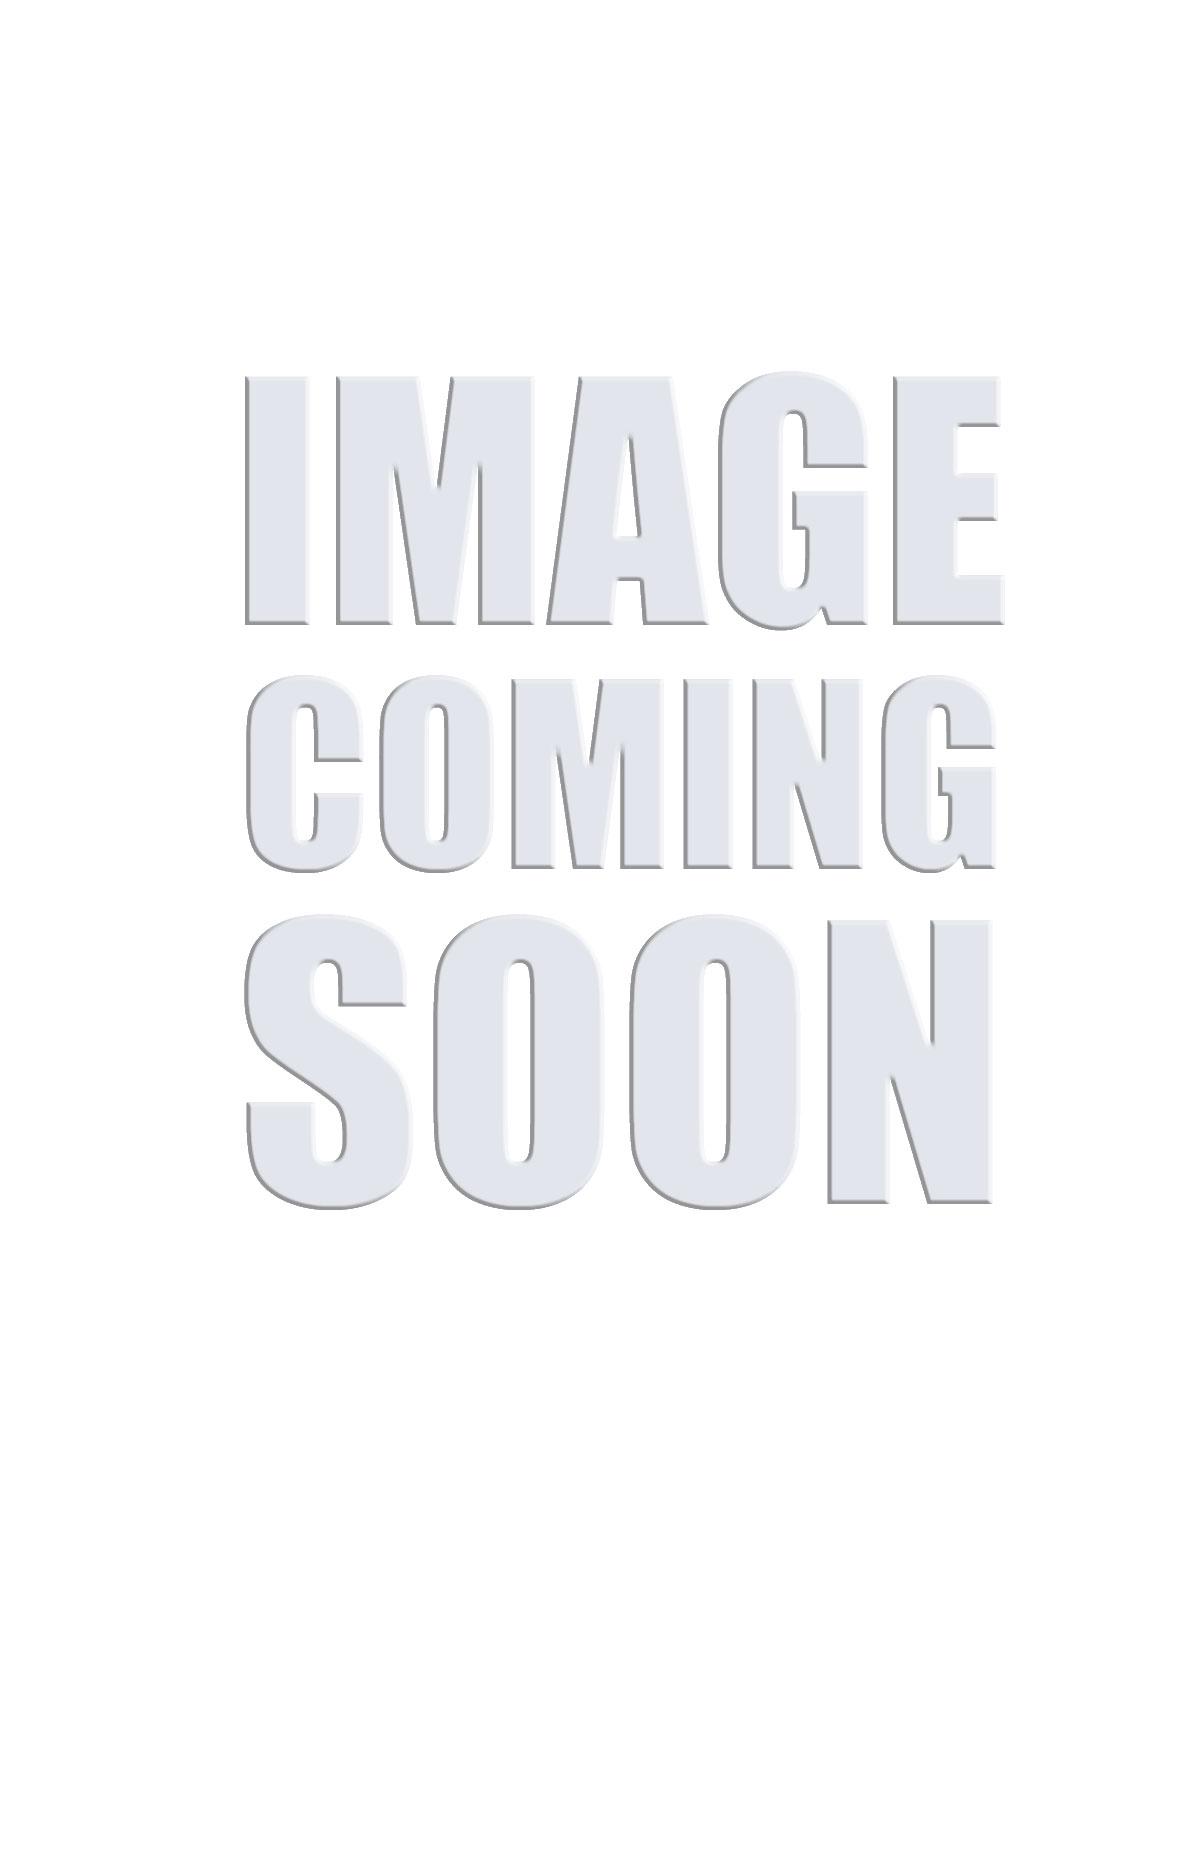 Peripheral Discharge Vacuum Motor - Lamb #116024-13, QBP, B/B, DI, AS, E, 2 STG